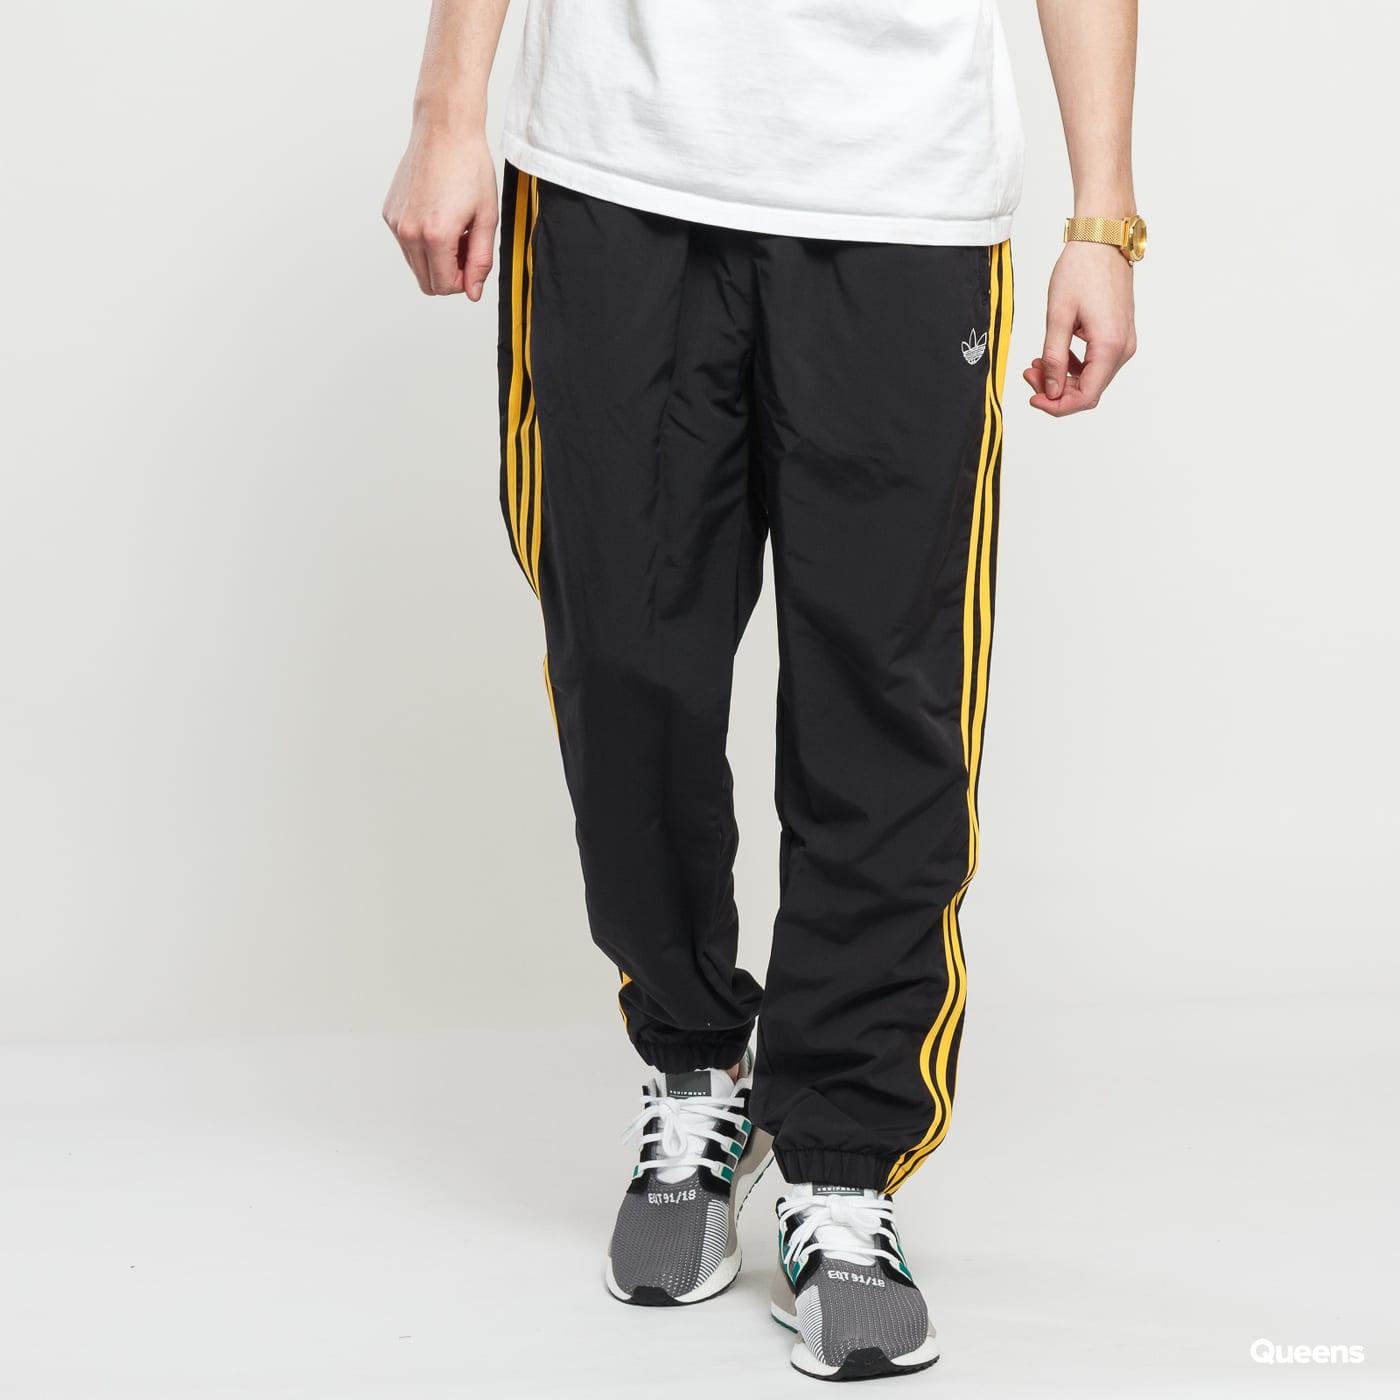 5b10ce30 adidas Originals Woven 3 Stripes Pant black / yellow